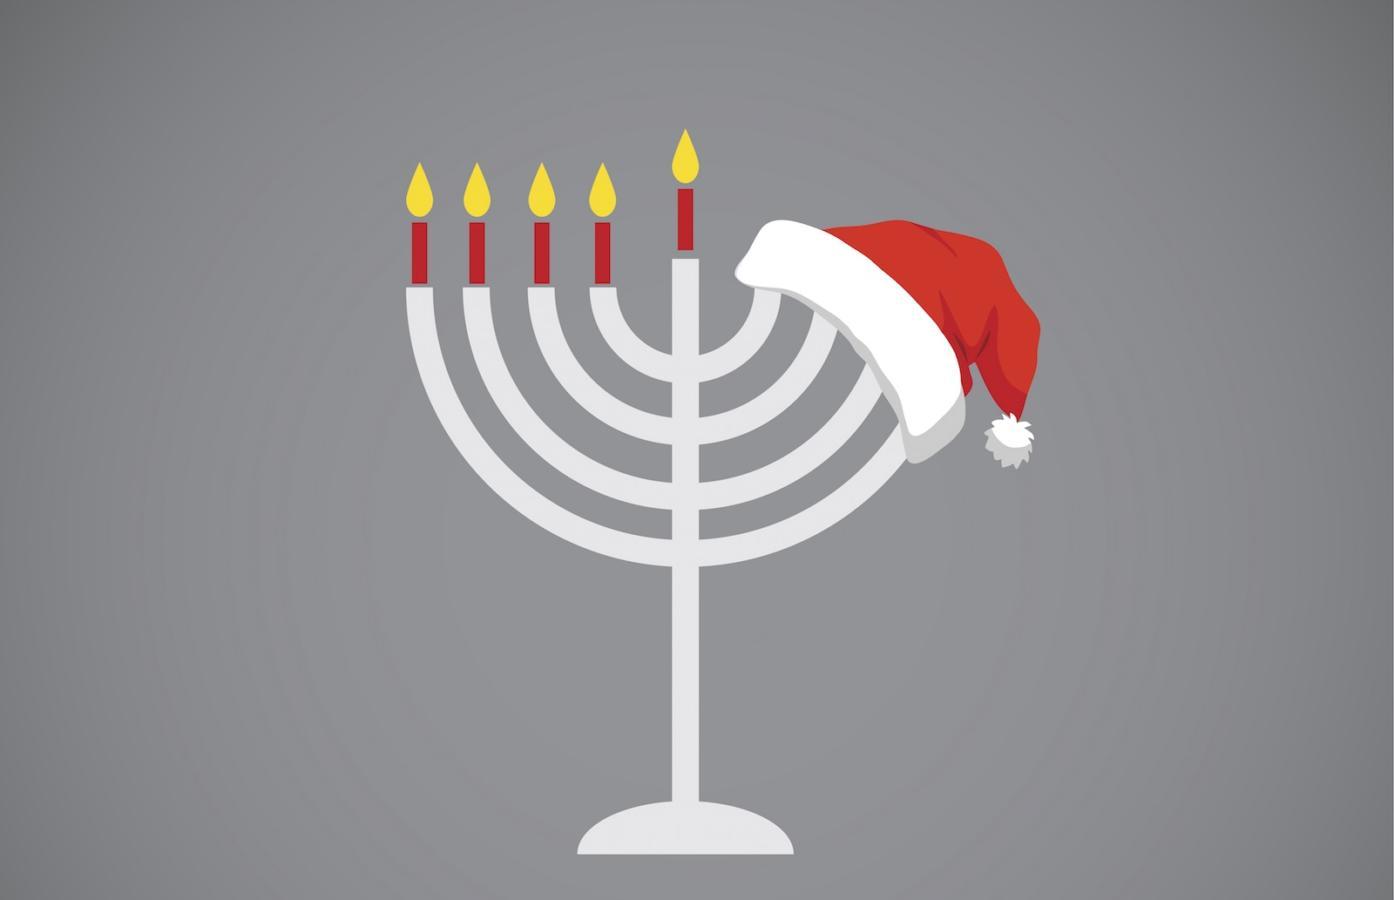 9 in 10 people in America celebrate Christmas each year